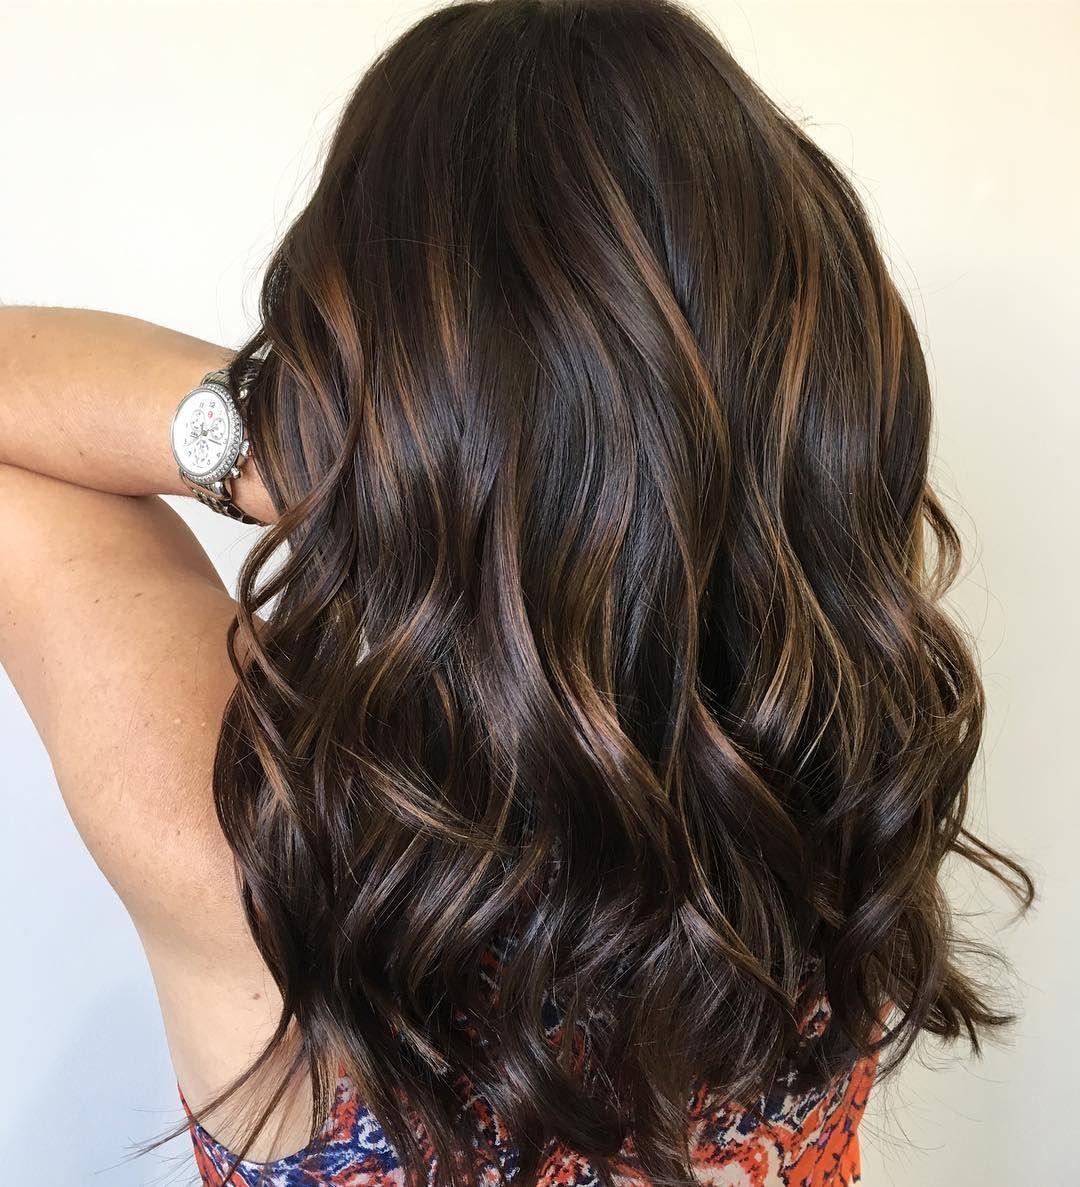 Wedding Hair Color Ideas: 100 Rustic Wedding Centerpiece Ideas - Fabmood